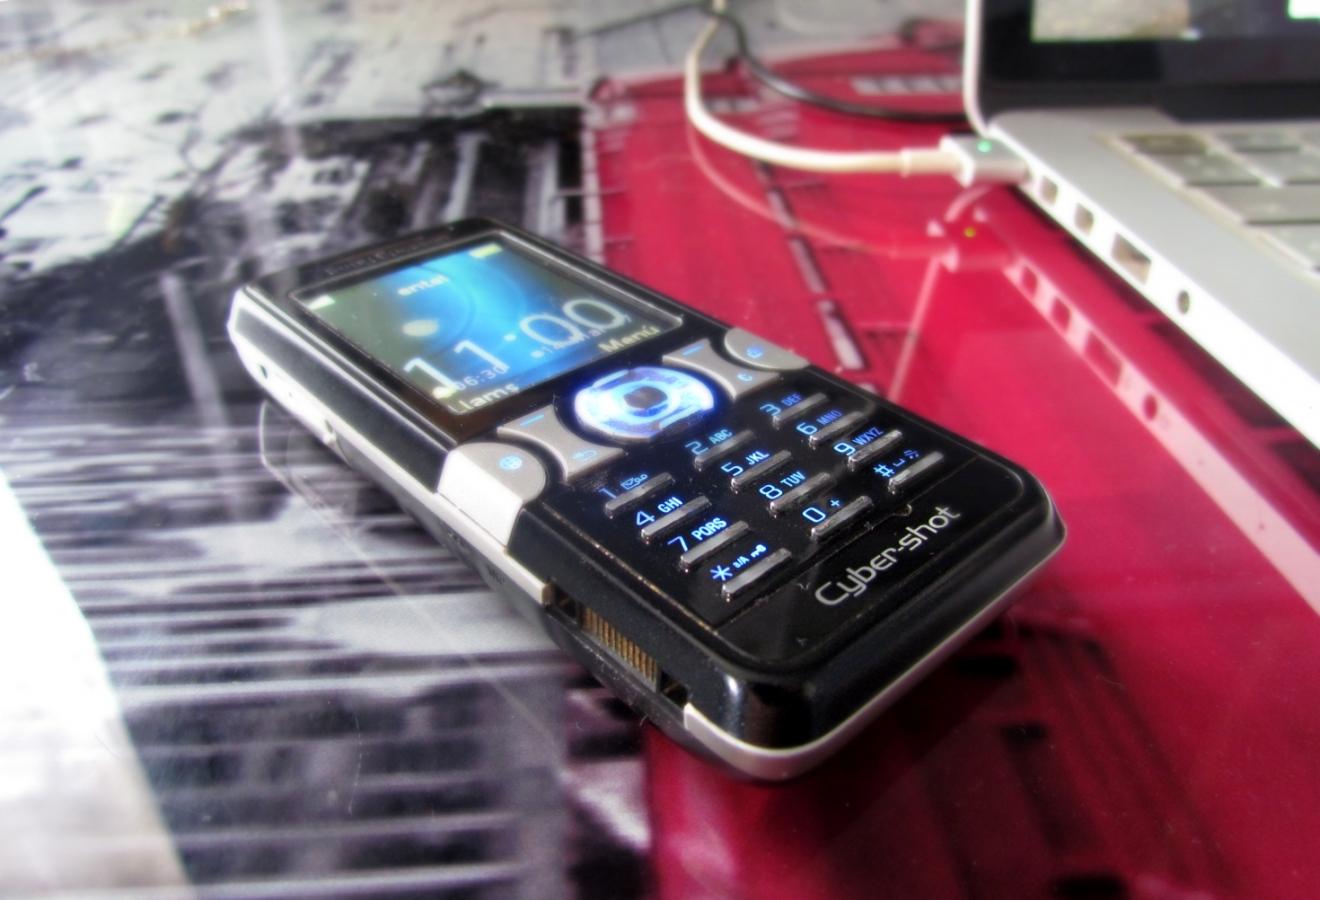 Imagen de celular Sony Ericsson k550i